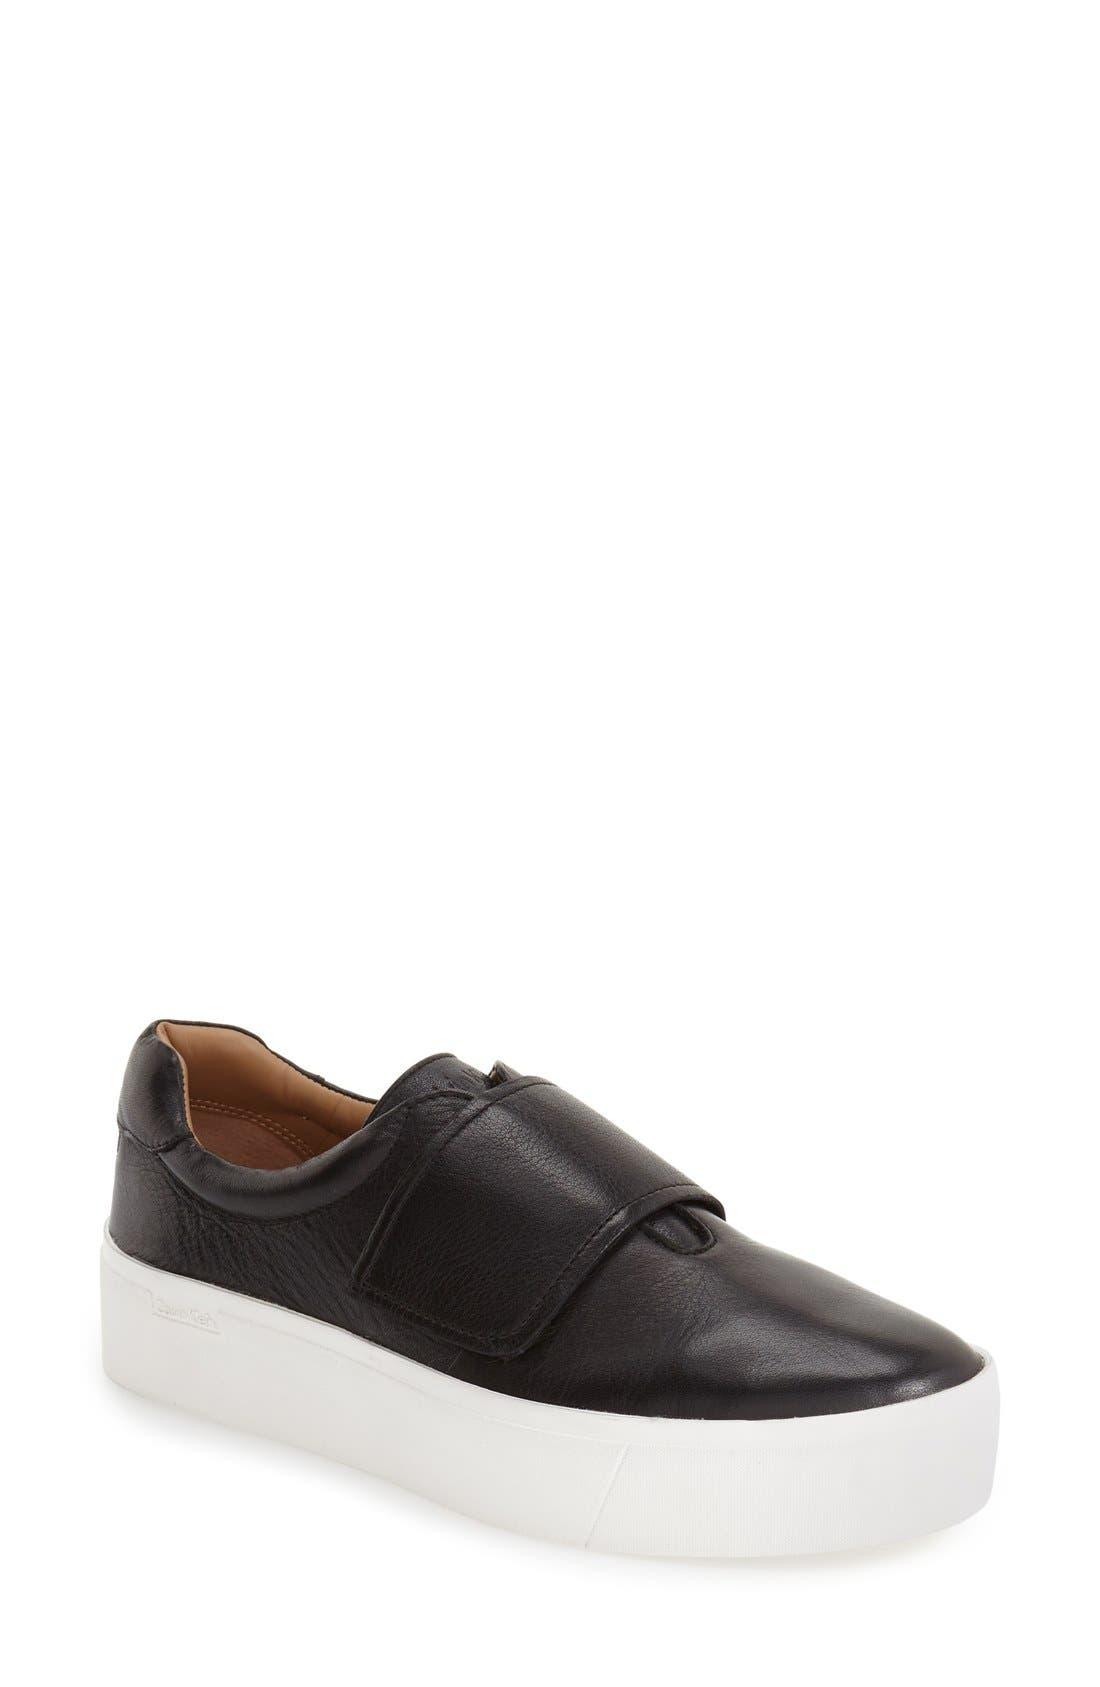 'Jaiden' Platform Sneaker,                             Main thumbnail 1, color,                             Black Leather